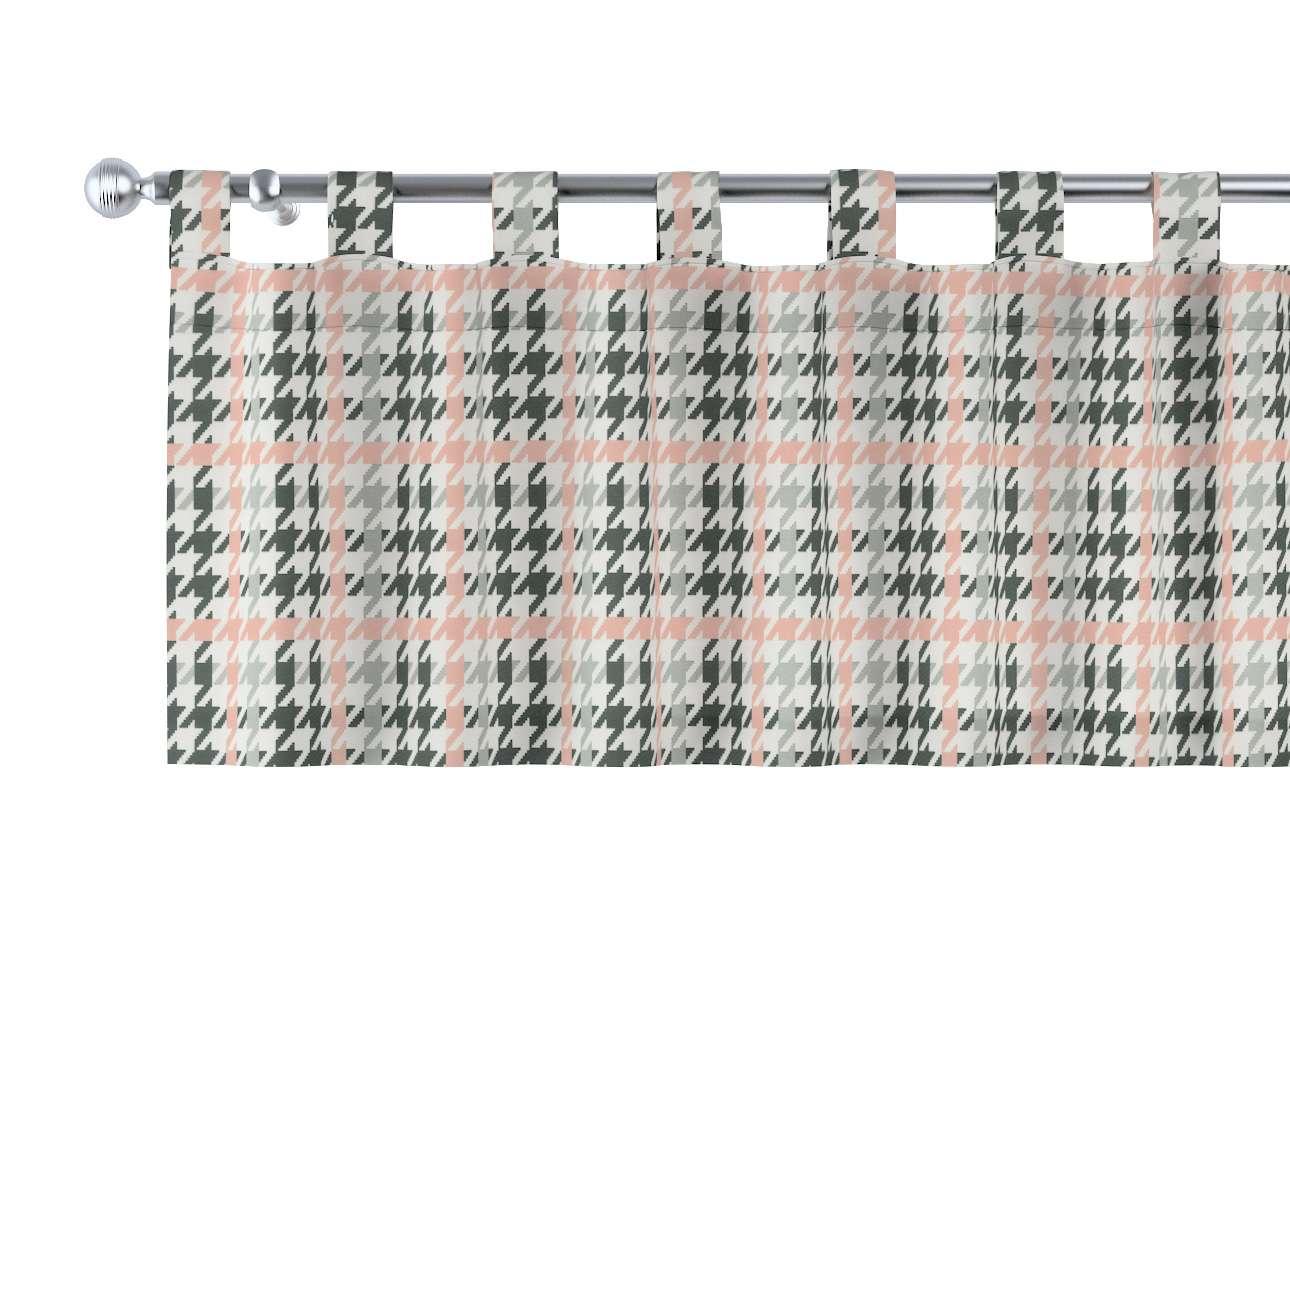 Gardinkappe med stropper 130 × 40 cm fra kollektionen Brooklyn, Stof: 137-75